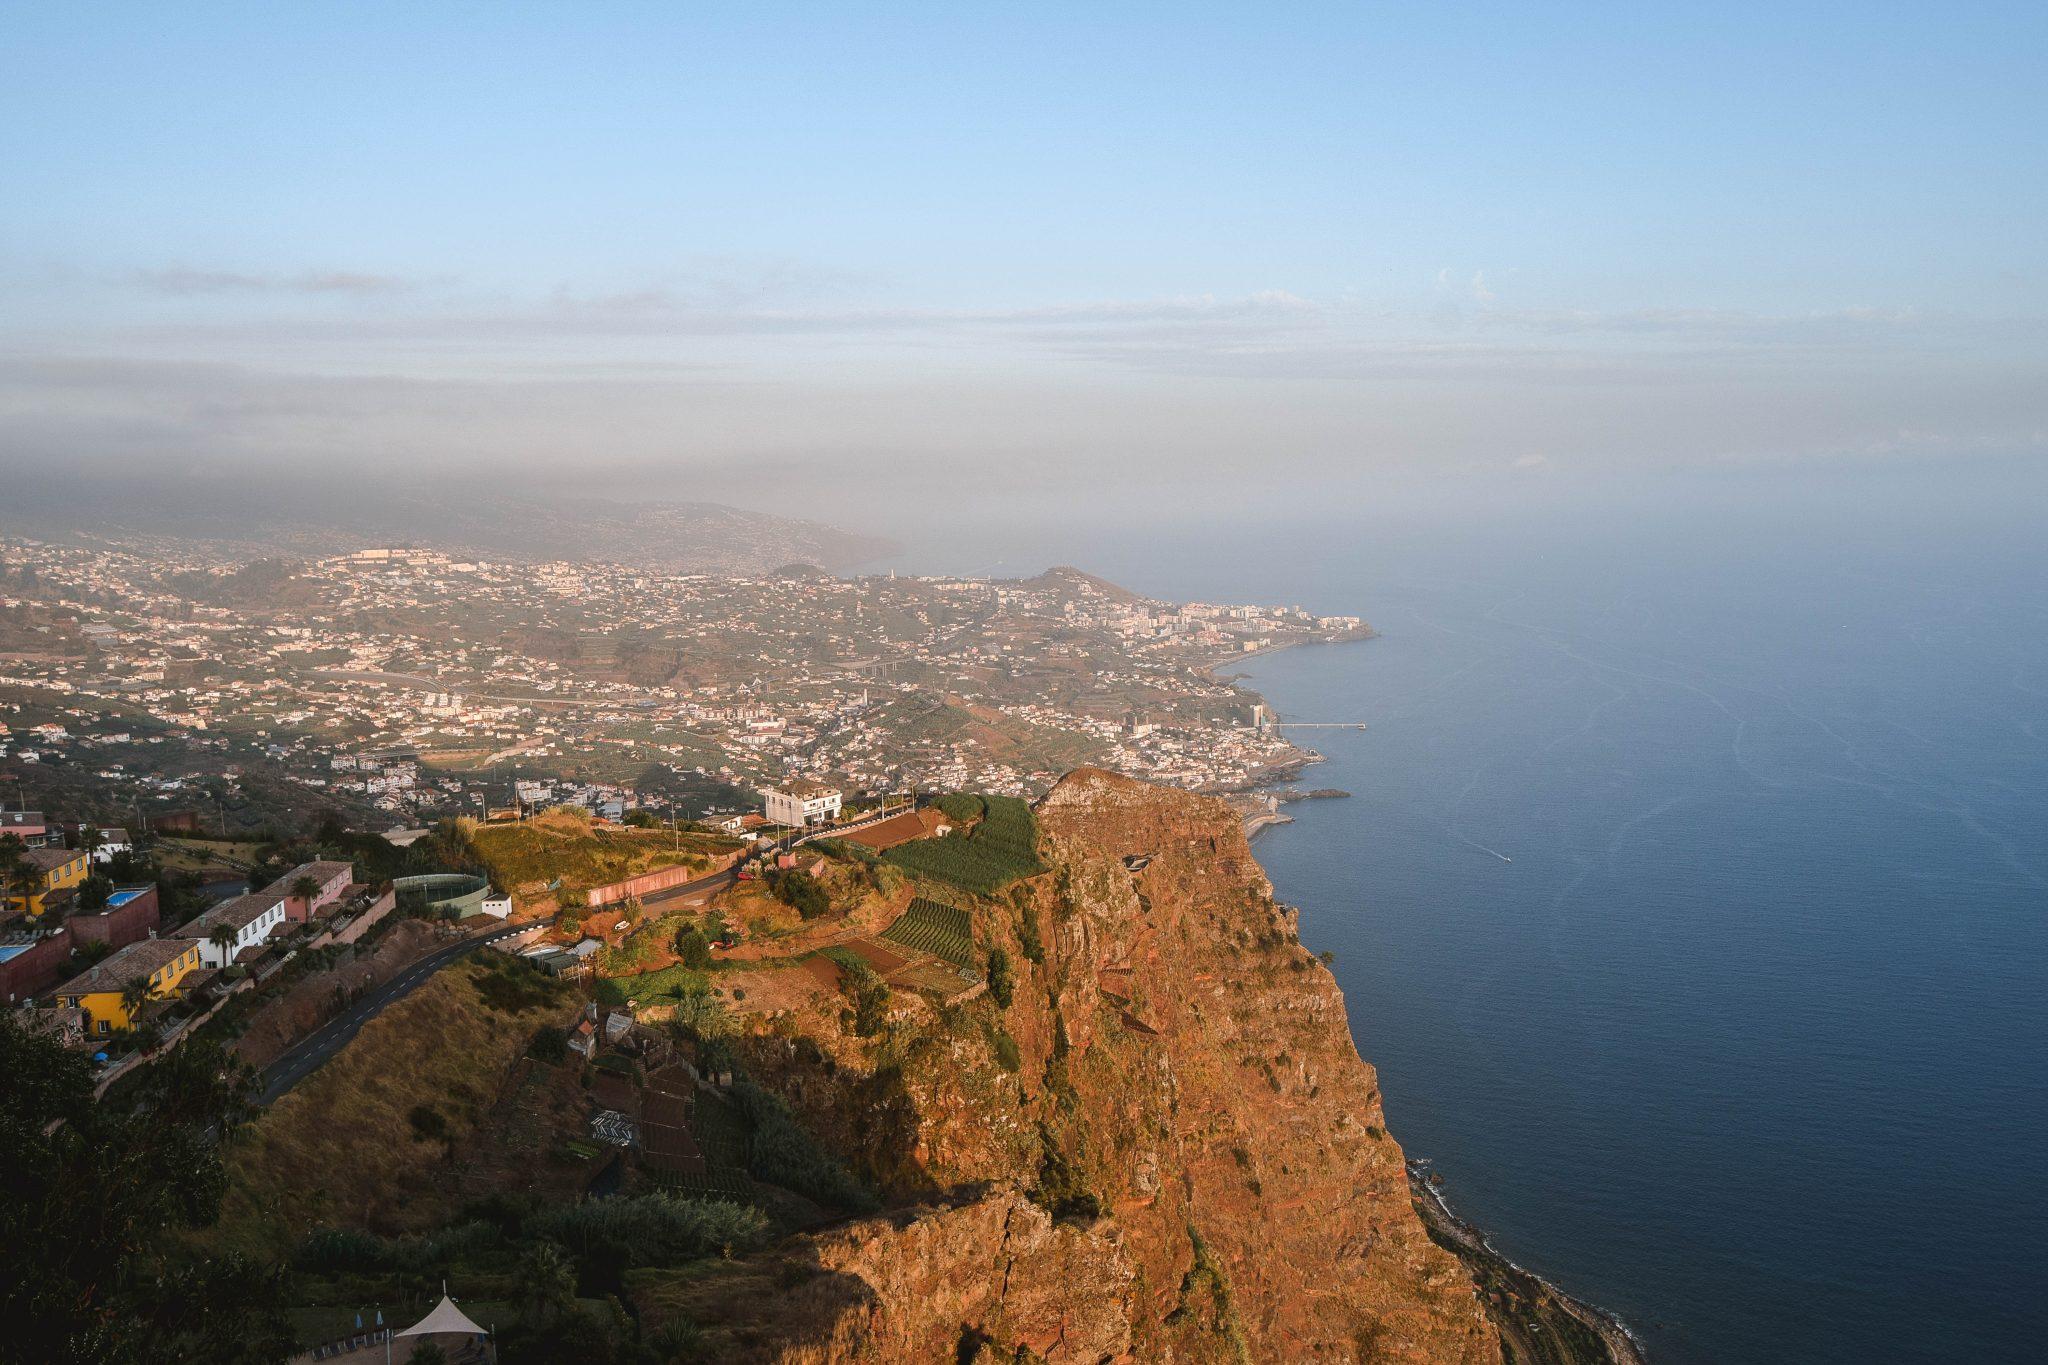 Wanderers & Warriors - Cabo Girao Skywalk Madeira Cabo Girao Cliffs Madeira Things To Do In Madeira